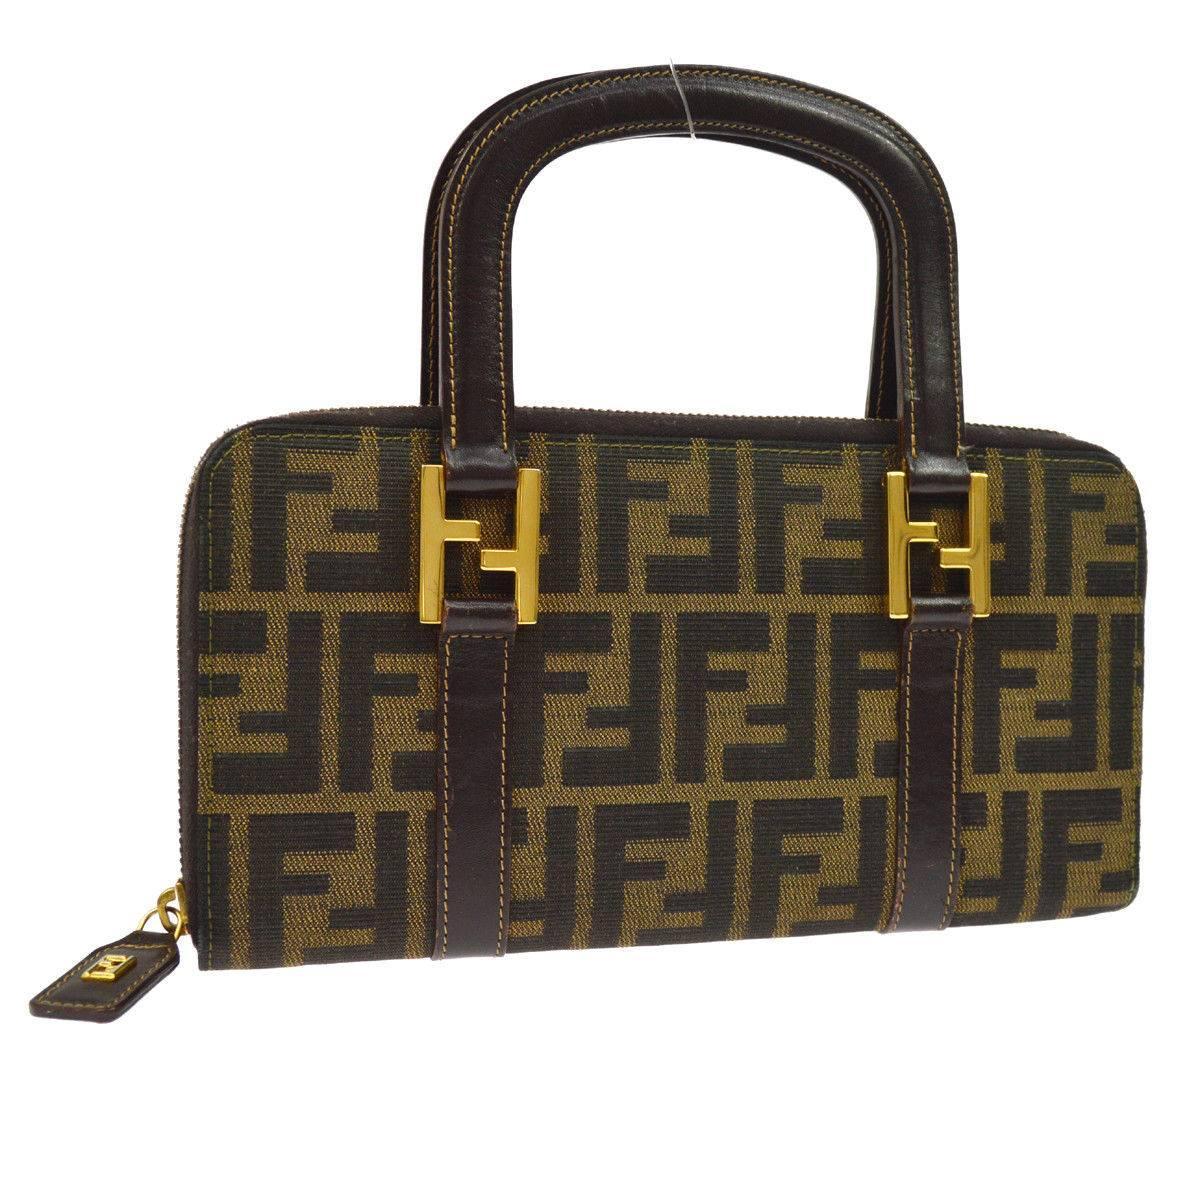 Fendi Monogram Canvas Logo Leather Round Evening Top Handle Satchel Bag j0Prq01